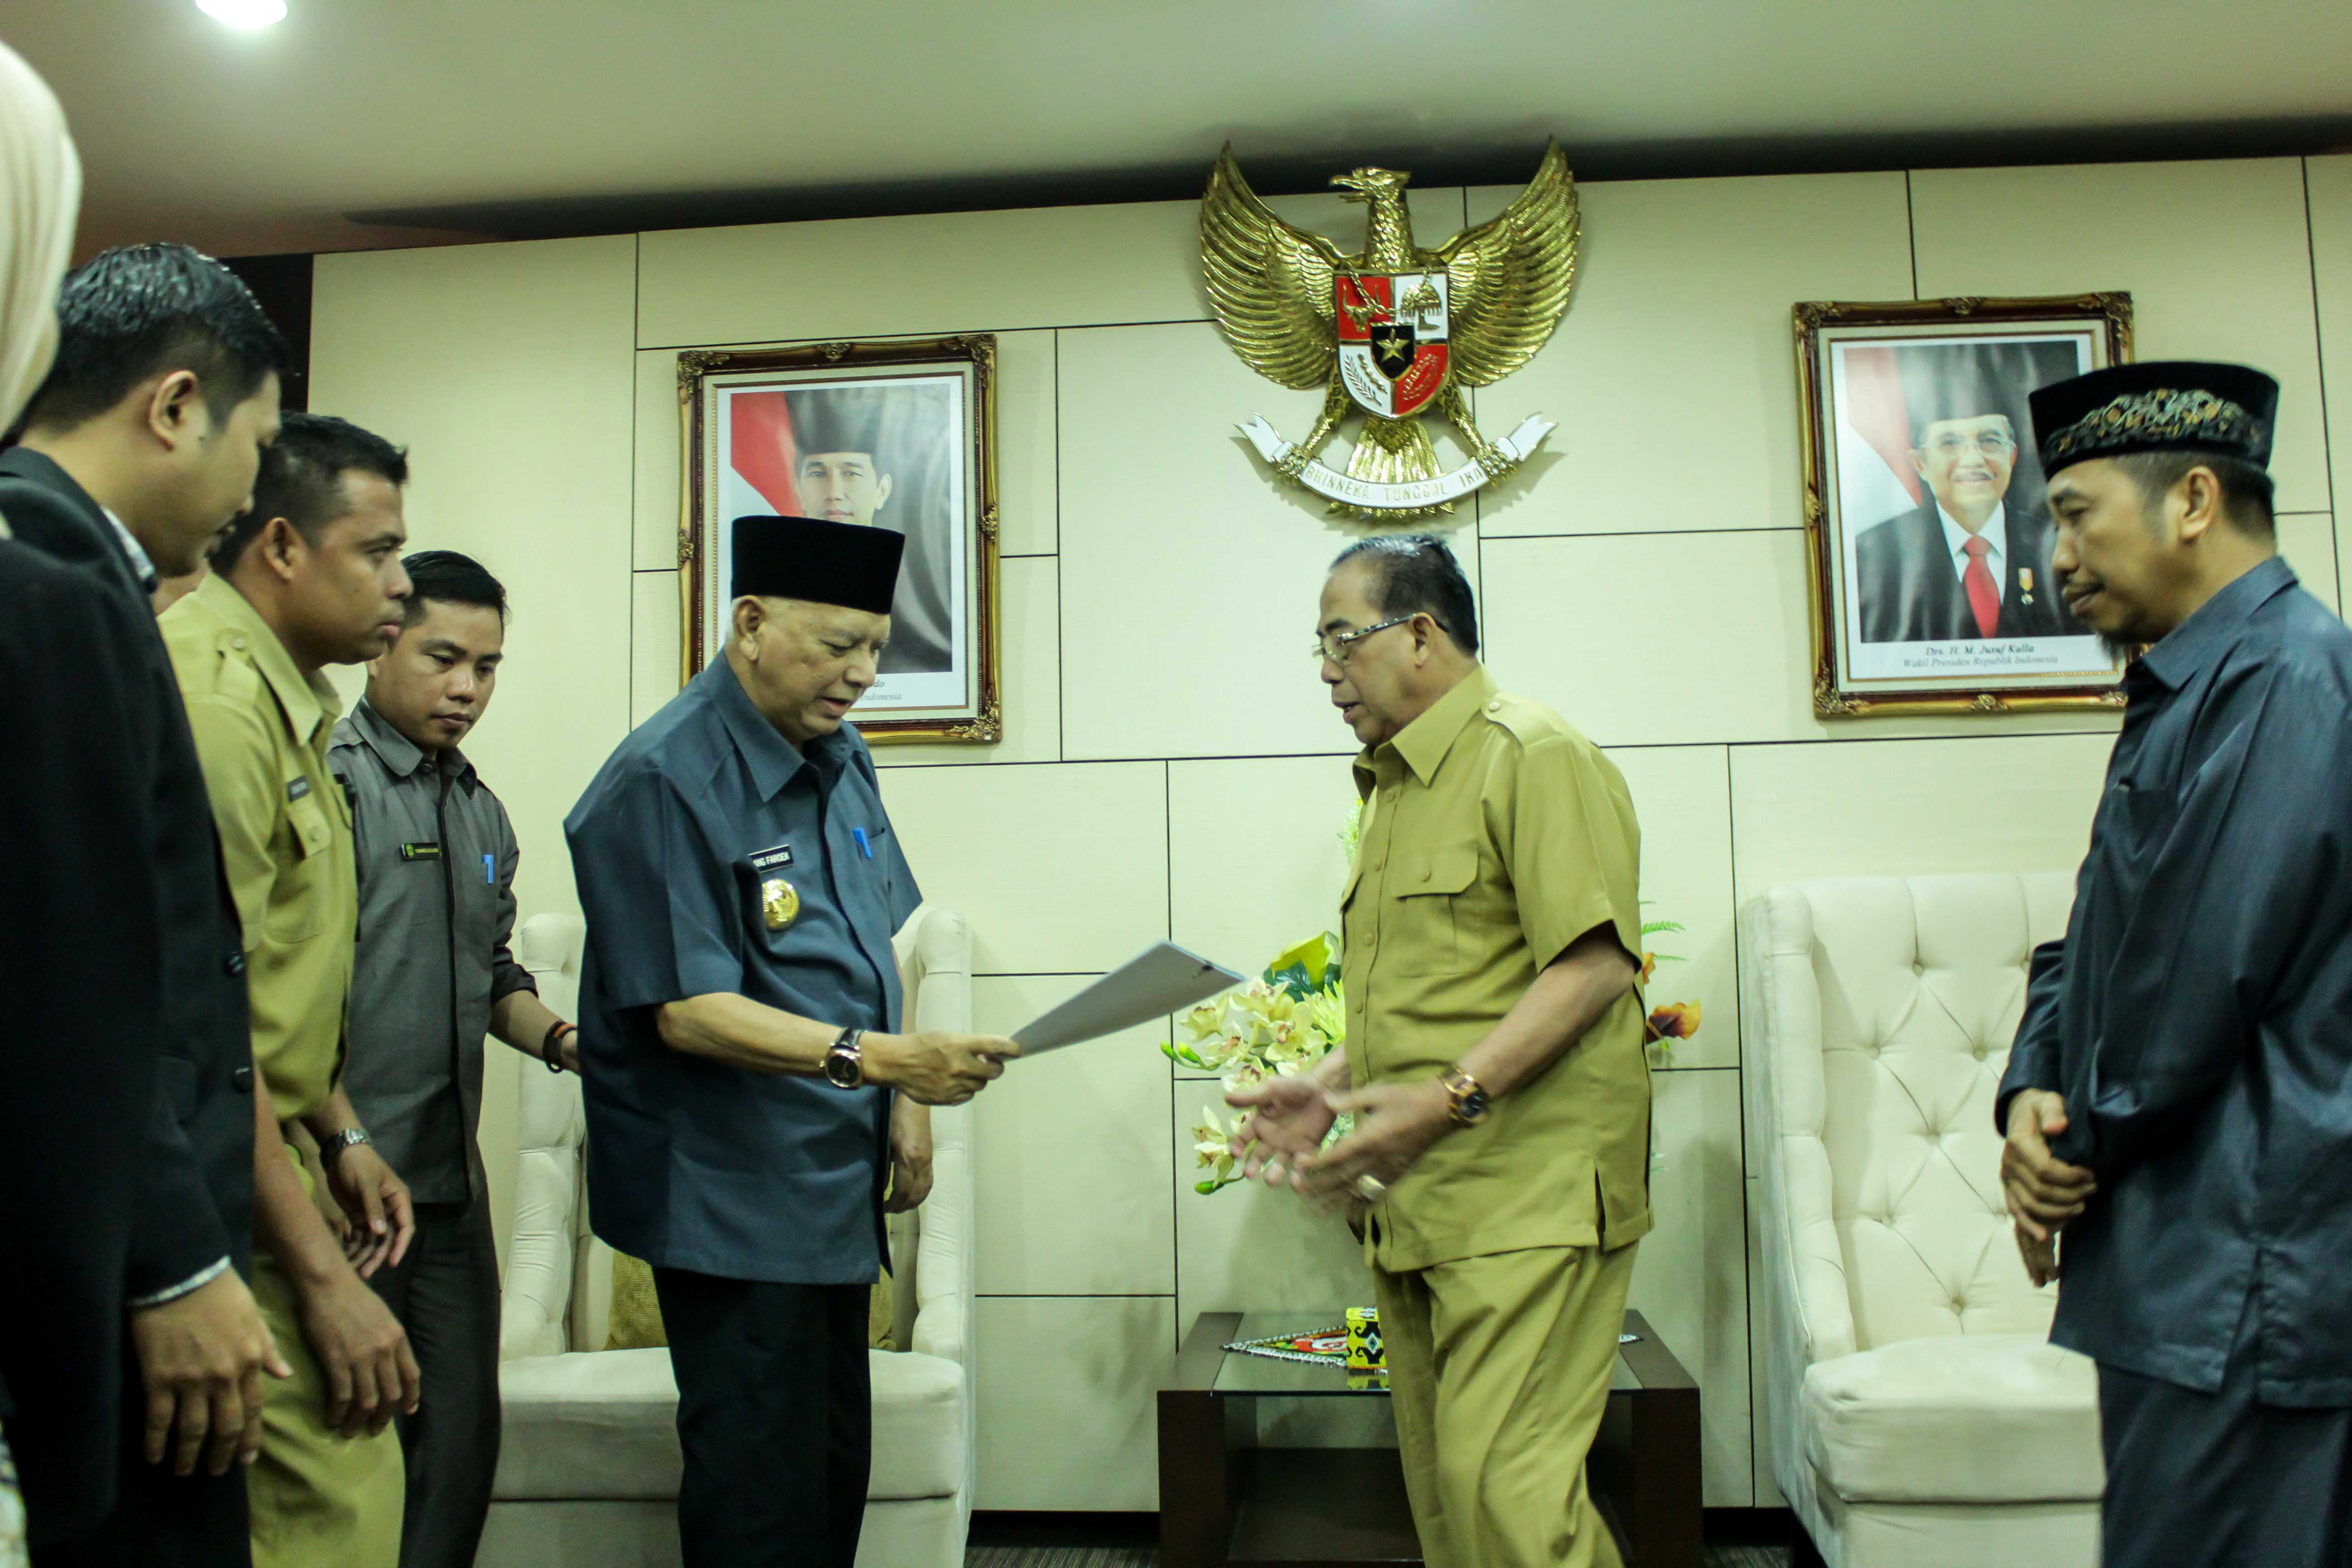 Wakil Bupati Paser dan Gubernur Kaltim Pada Acara Penyerahan Izin Prinsip Penyiaran RPK Kabupaten Paser